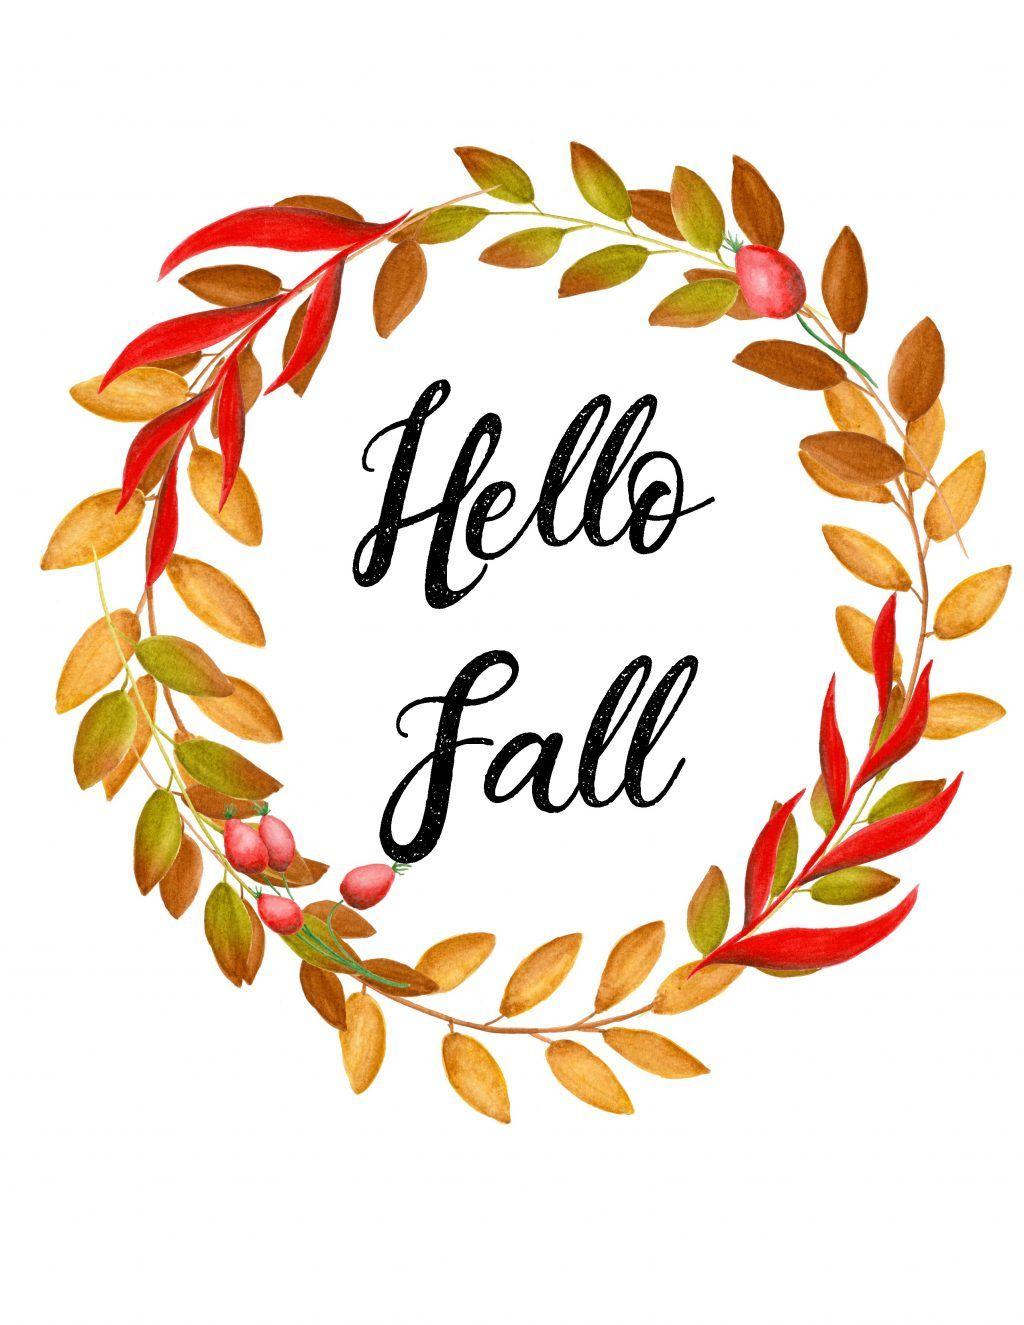 Free Autumn Printables- Watercolor and Calligraphy fall art #hellofall